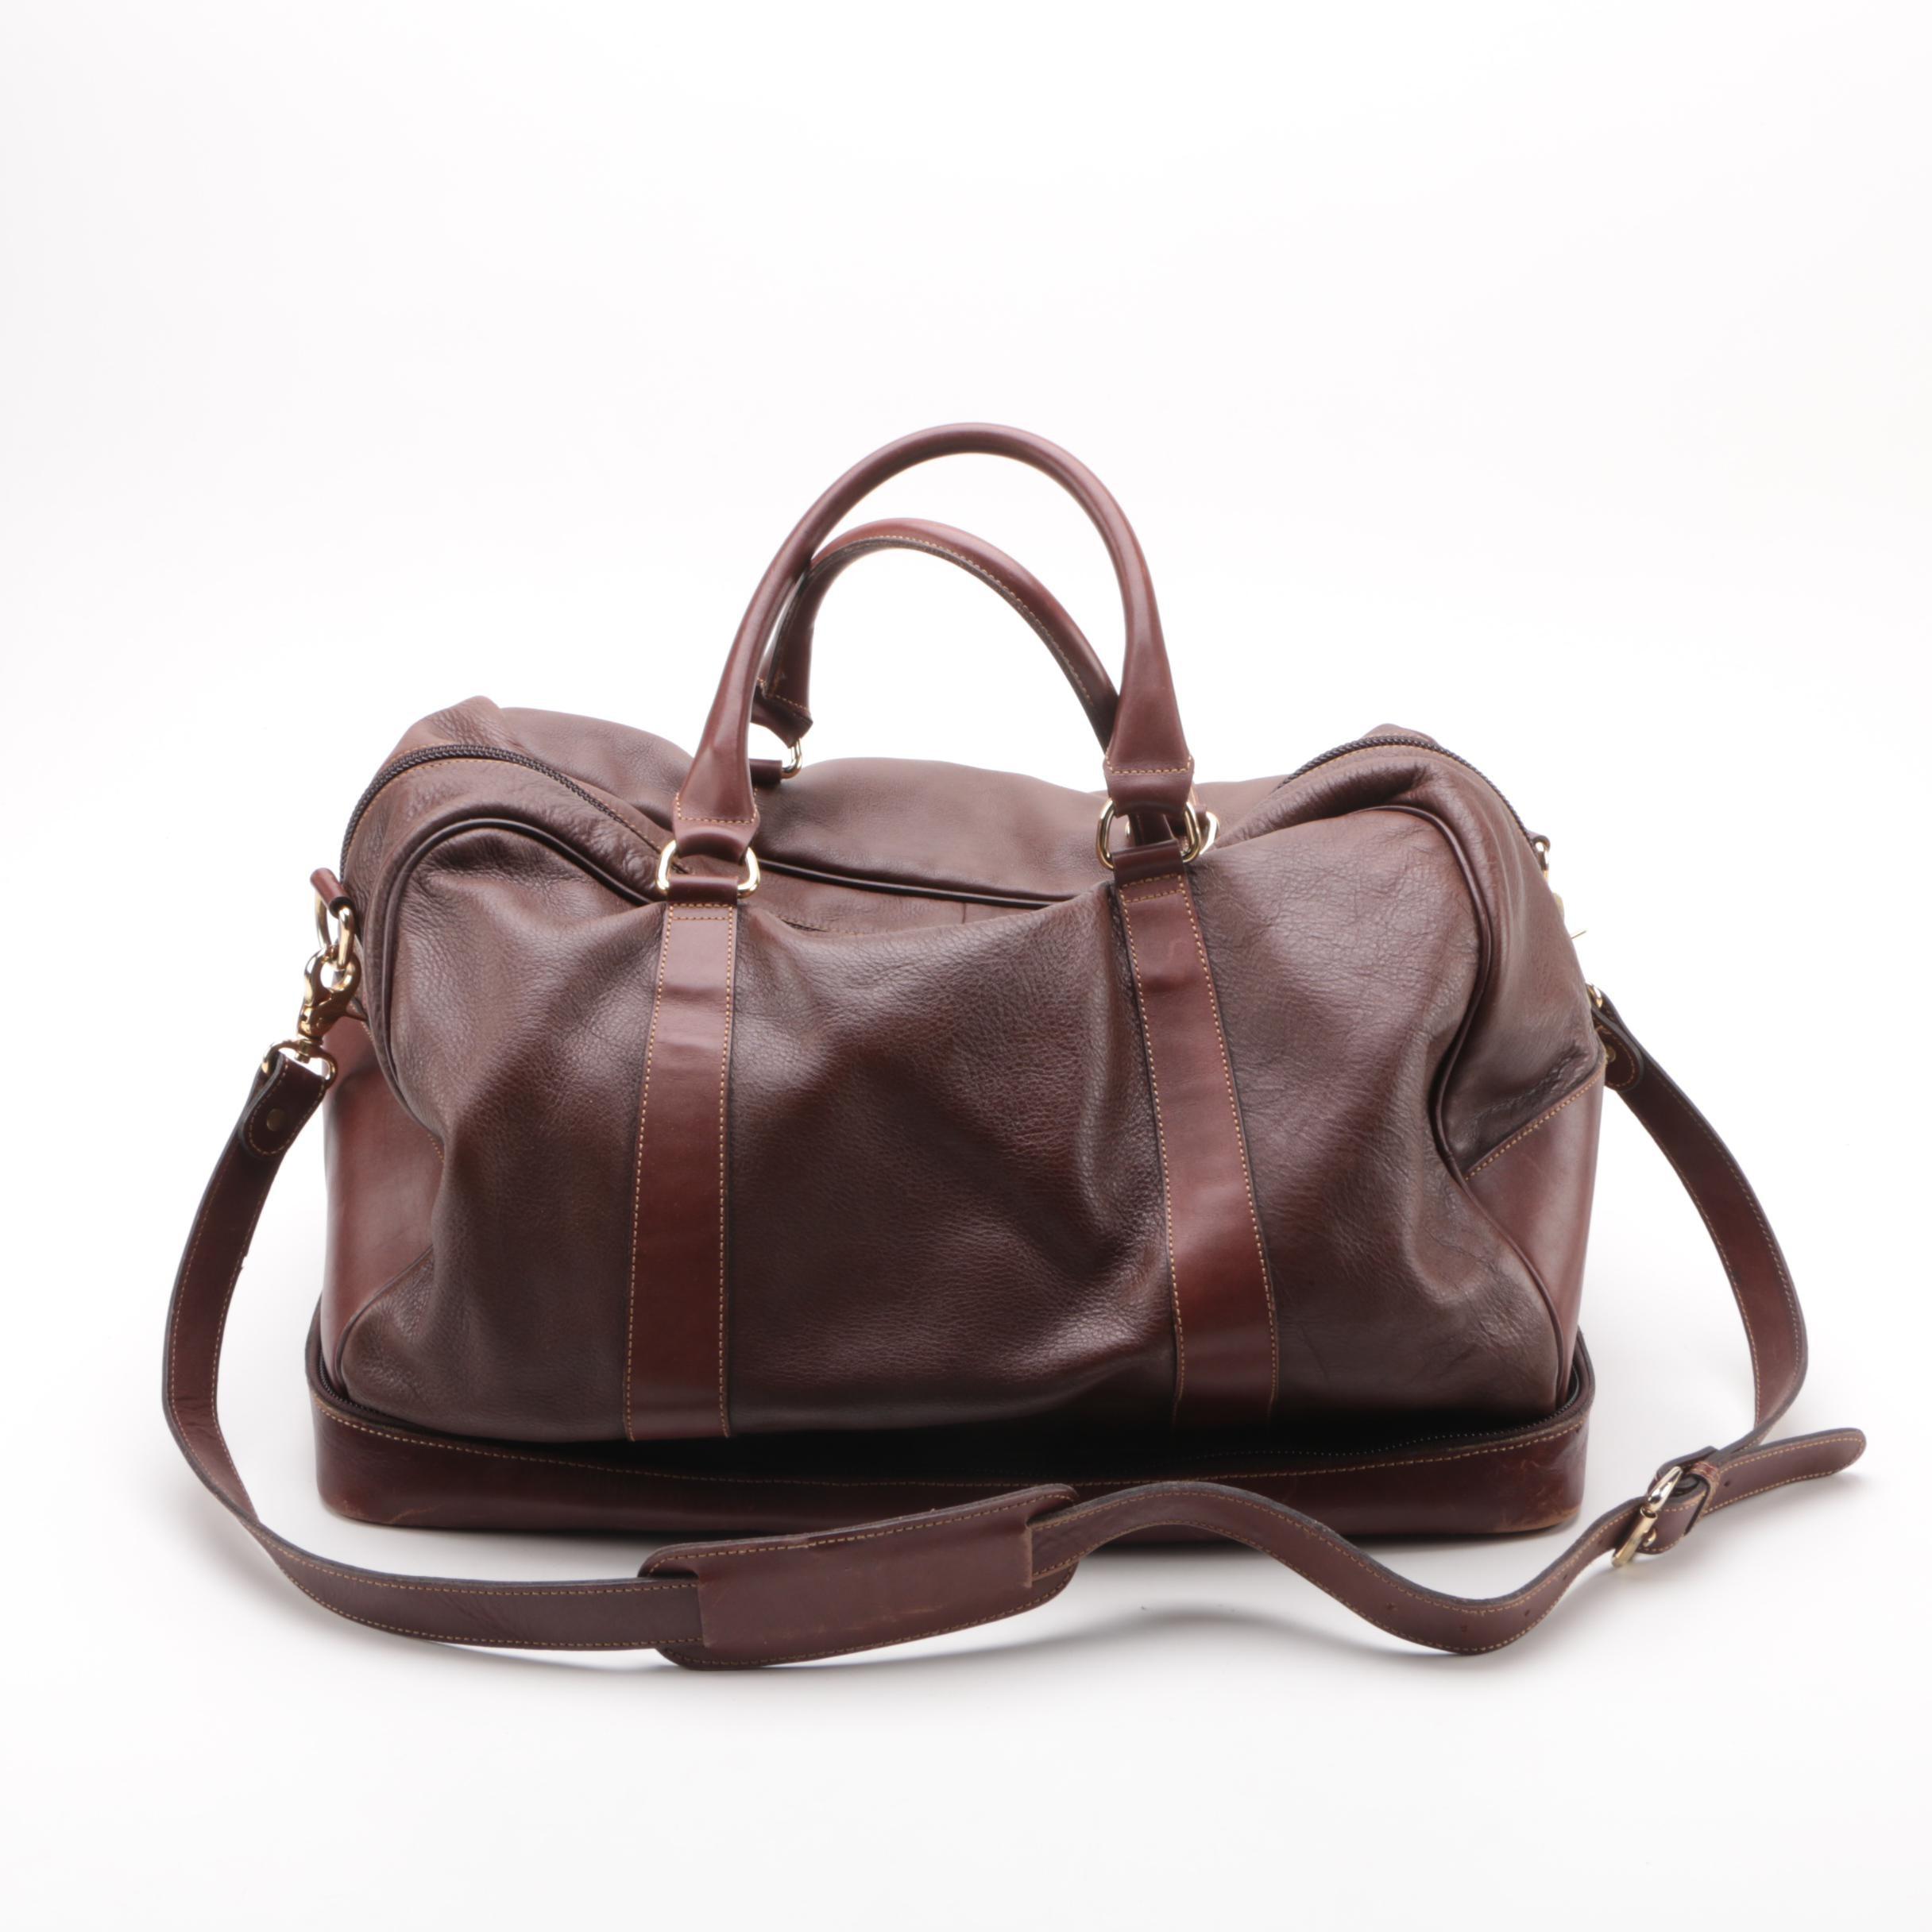 D'Italia Brown Leather Duffel Bag